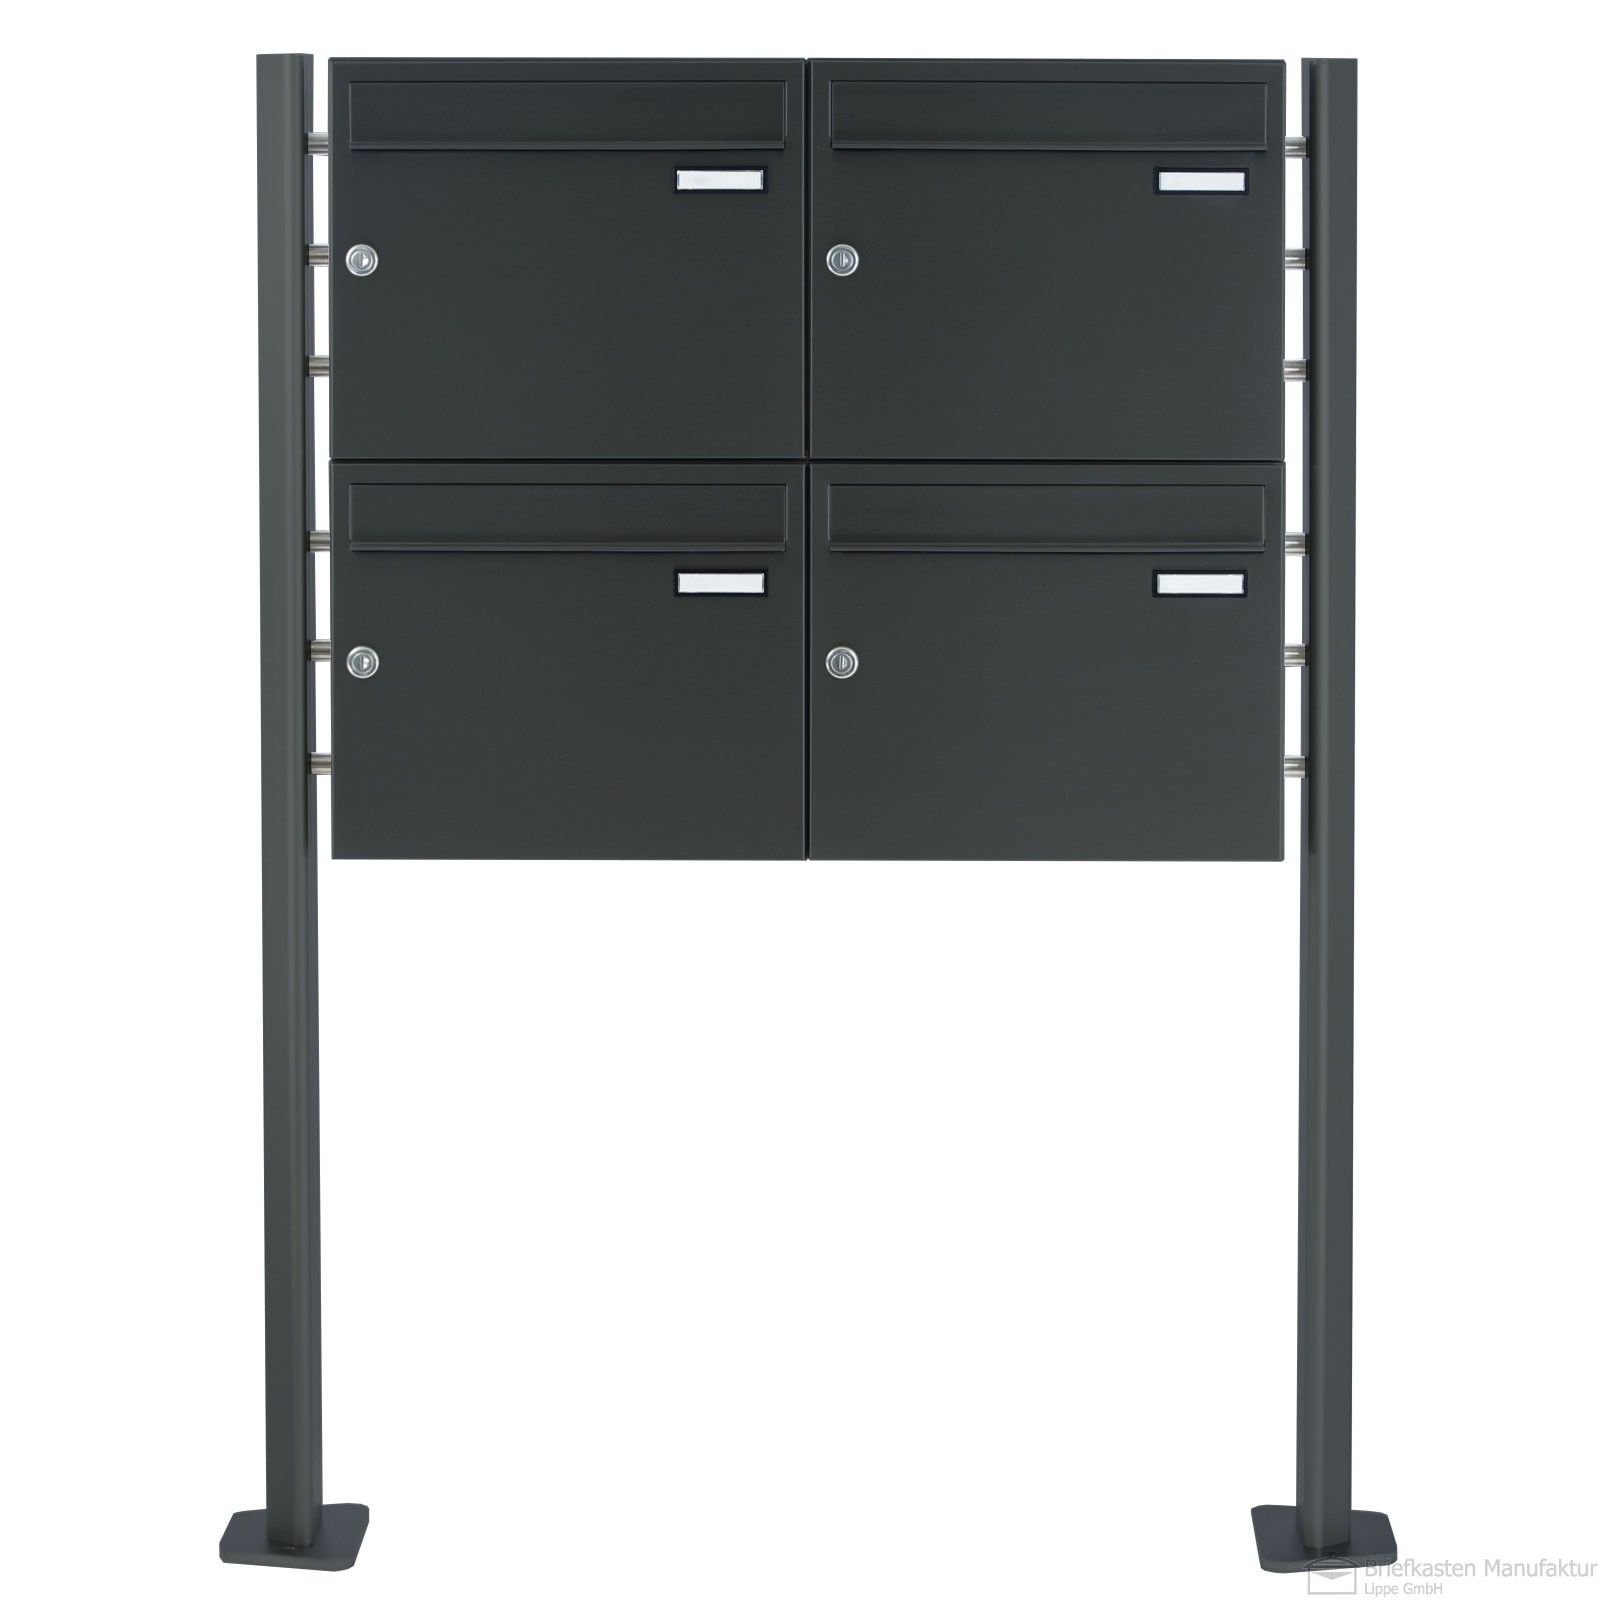 4er Standbriefkasten - Anthrazit-Grau RAL 7016 - PREMIUM-ELEGANCE - Standelemente, massiv aus Aluminium-Profil